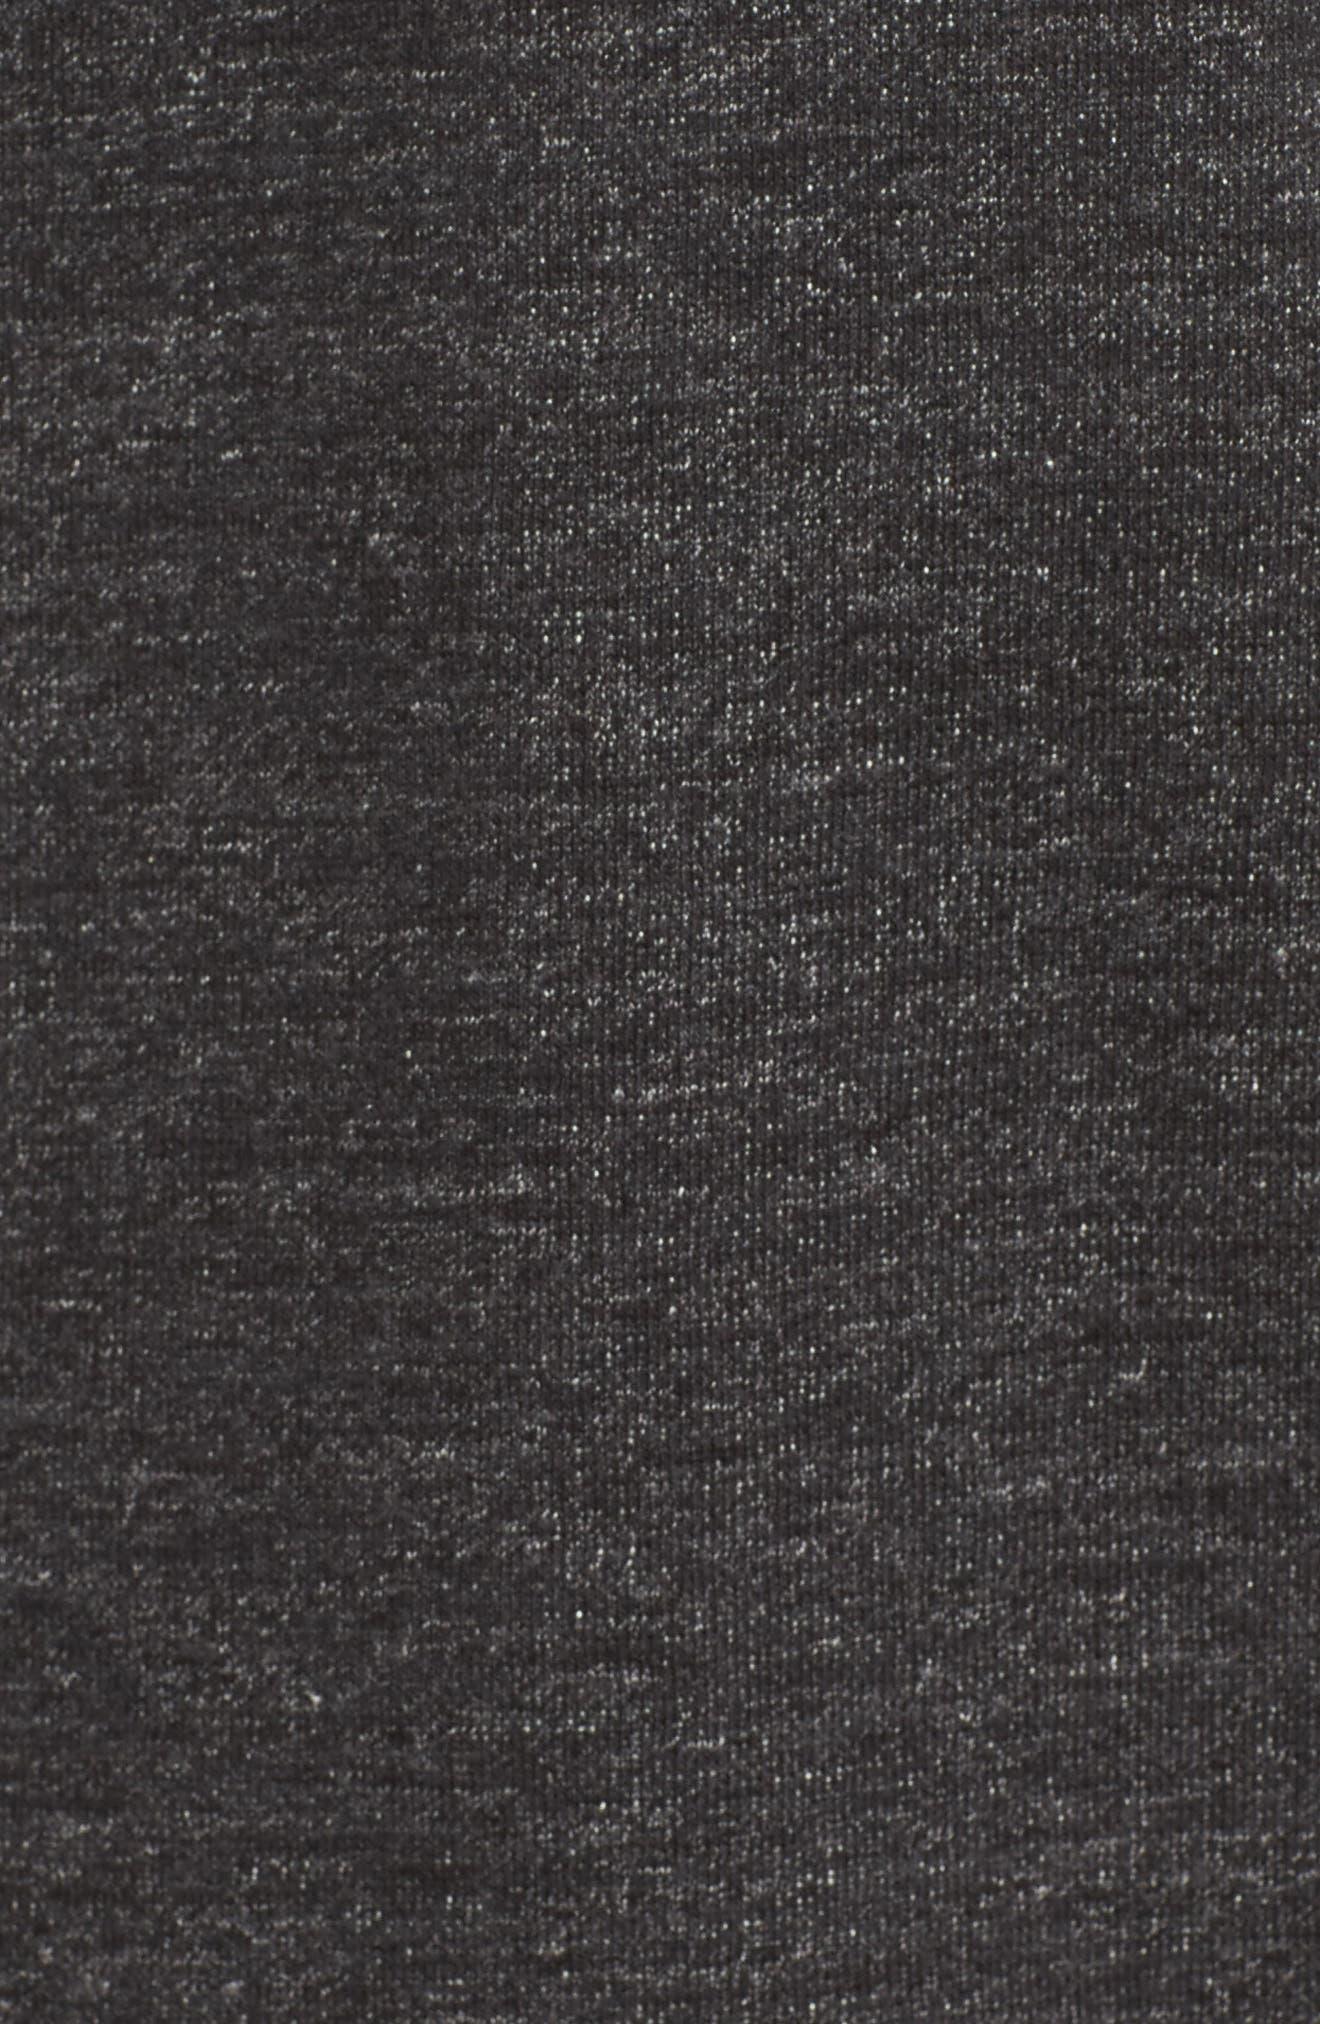 Legacy Raglan Crewneck Sweatshirt,                             Alternate thumbnail 10, color,